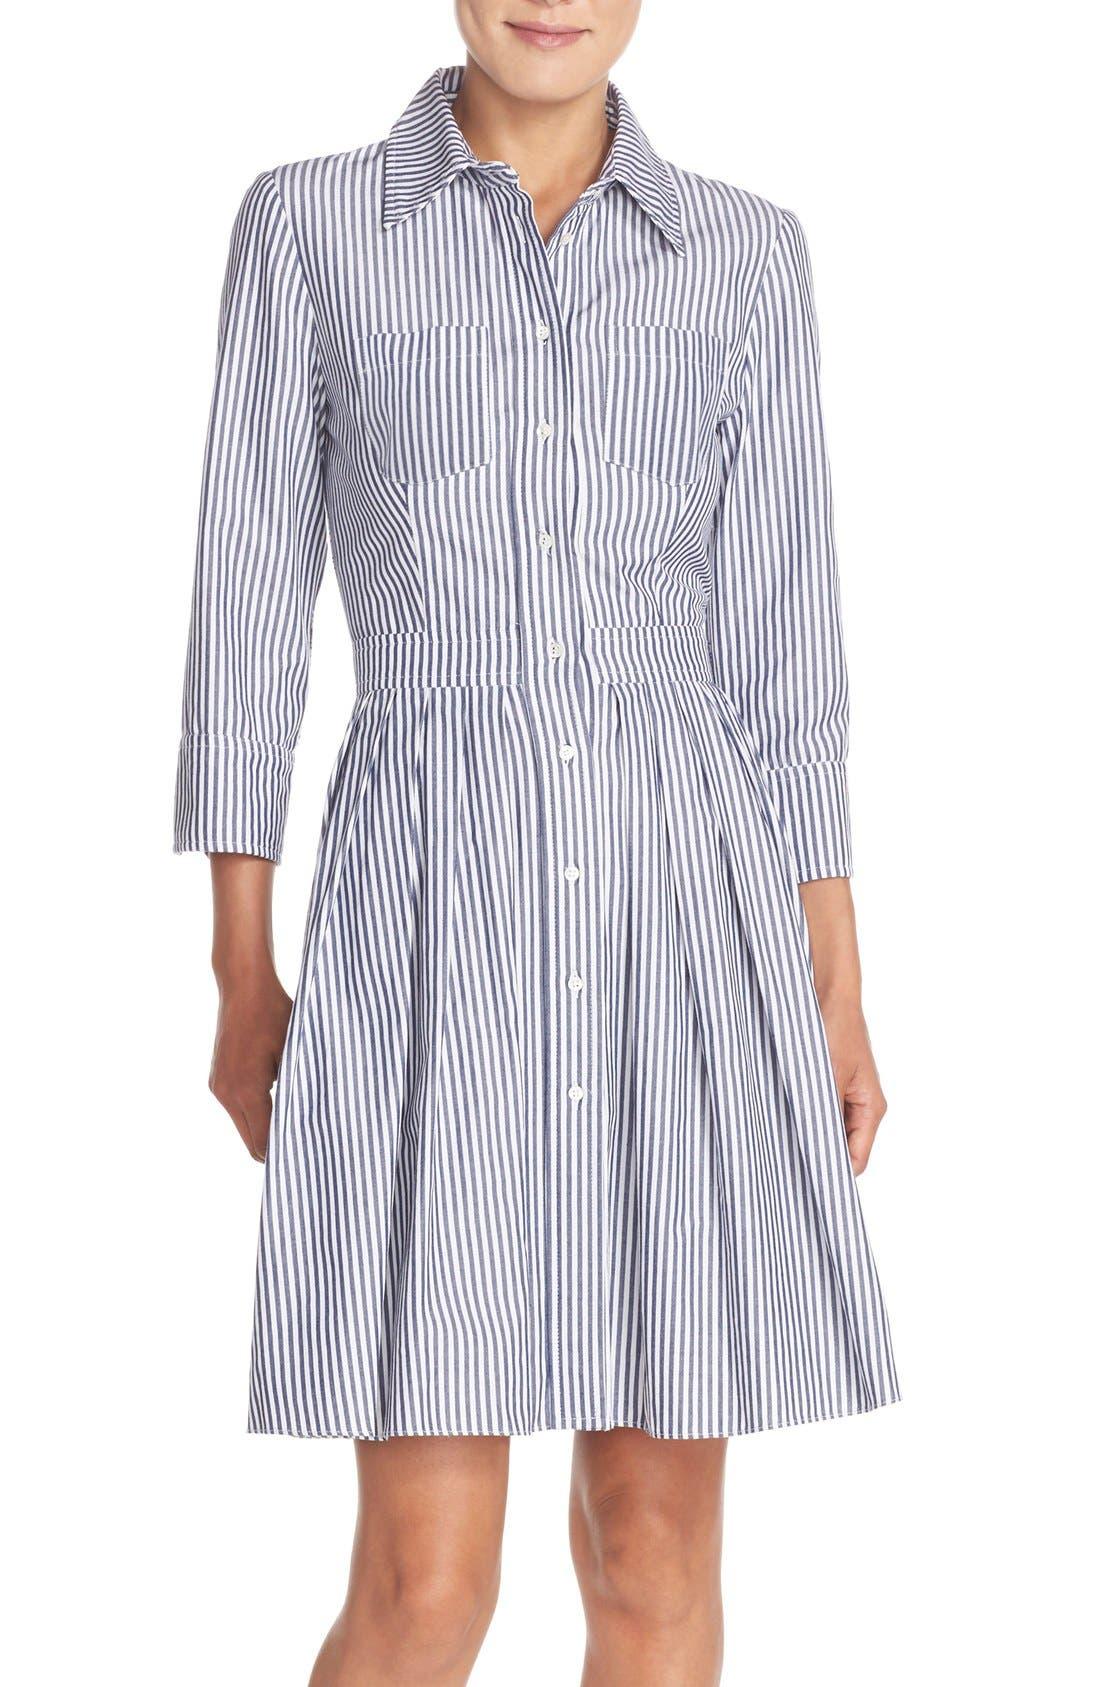 Stripe Cotton Shirtdress, Main, color, 421